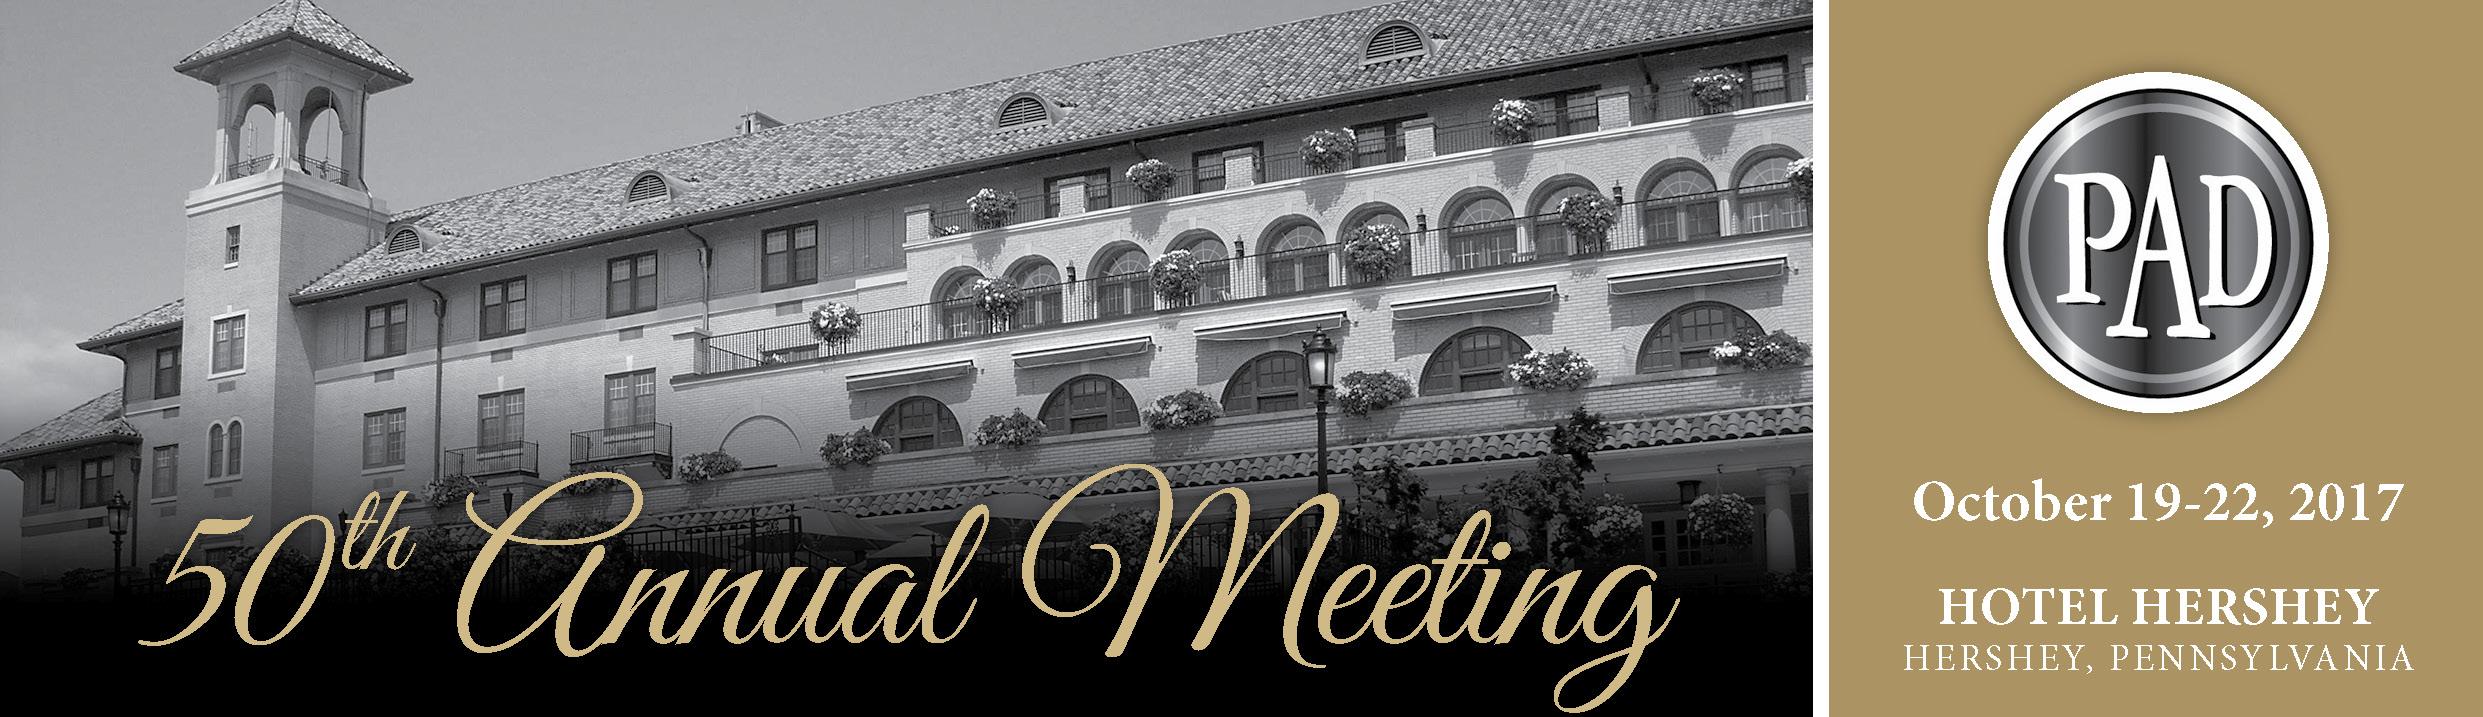 Pennsylvania Academy of Dermatology - 50th Annual Meeting